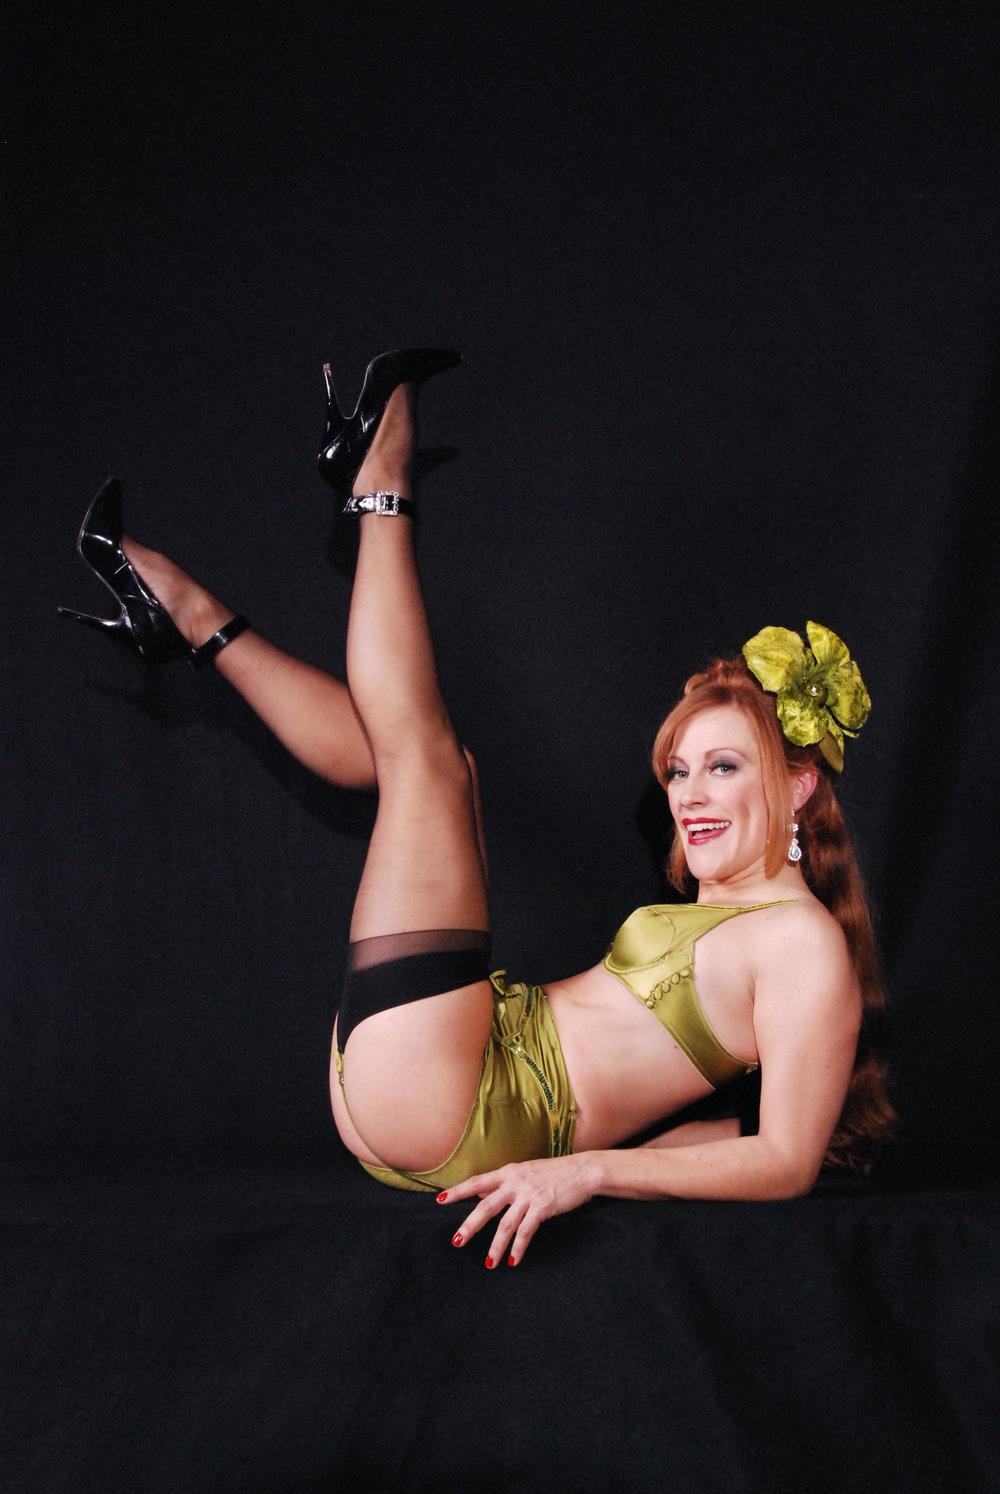 Trixie_Chartreuse_Legs.jpg